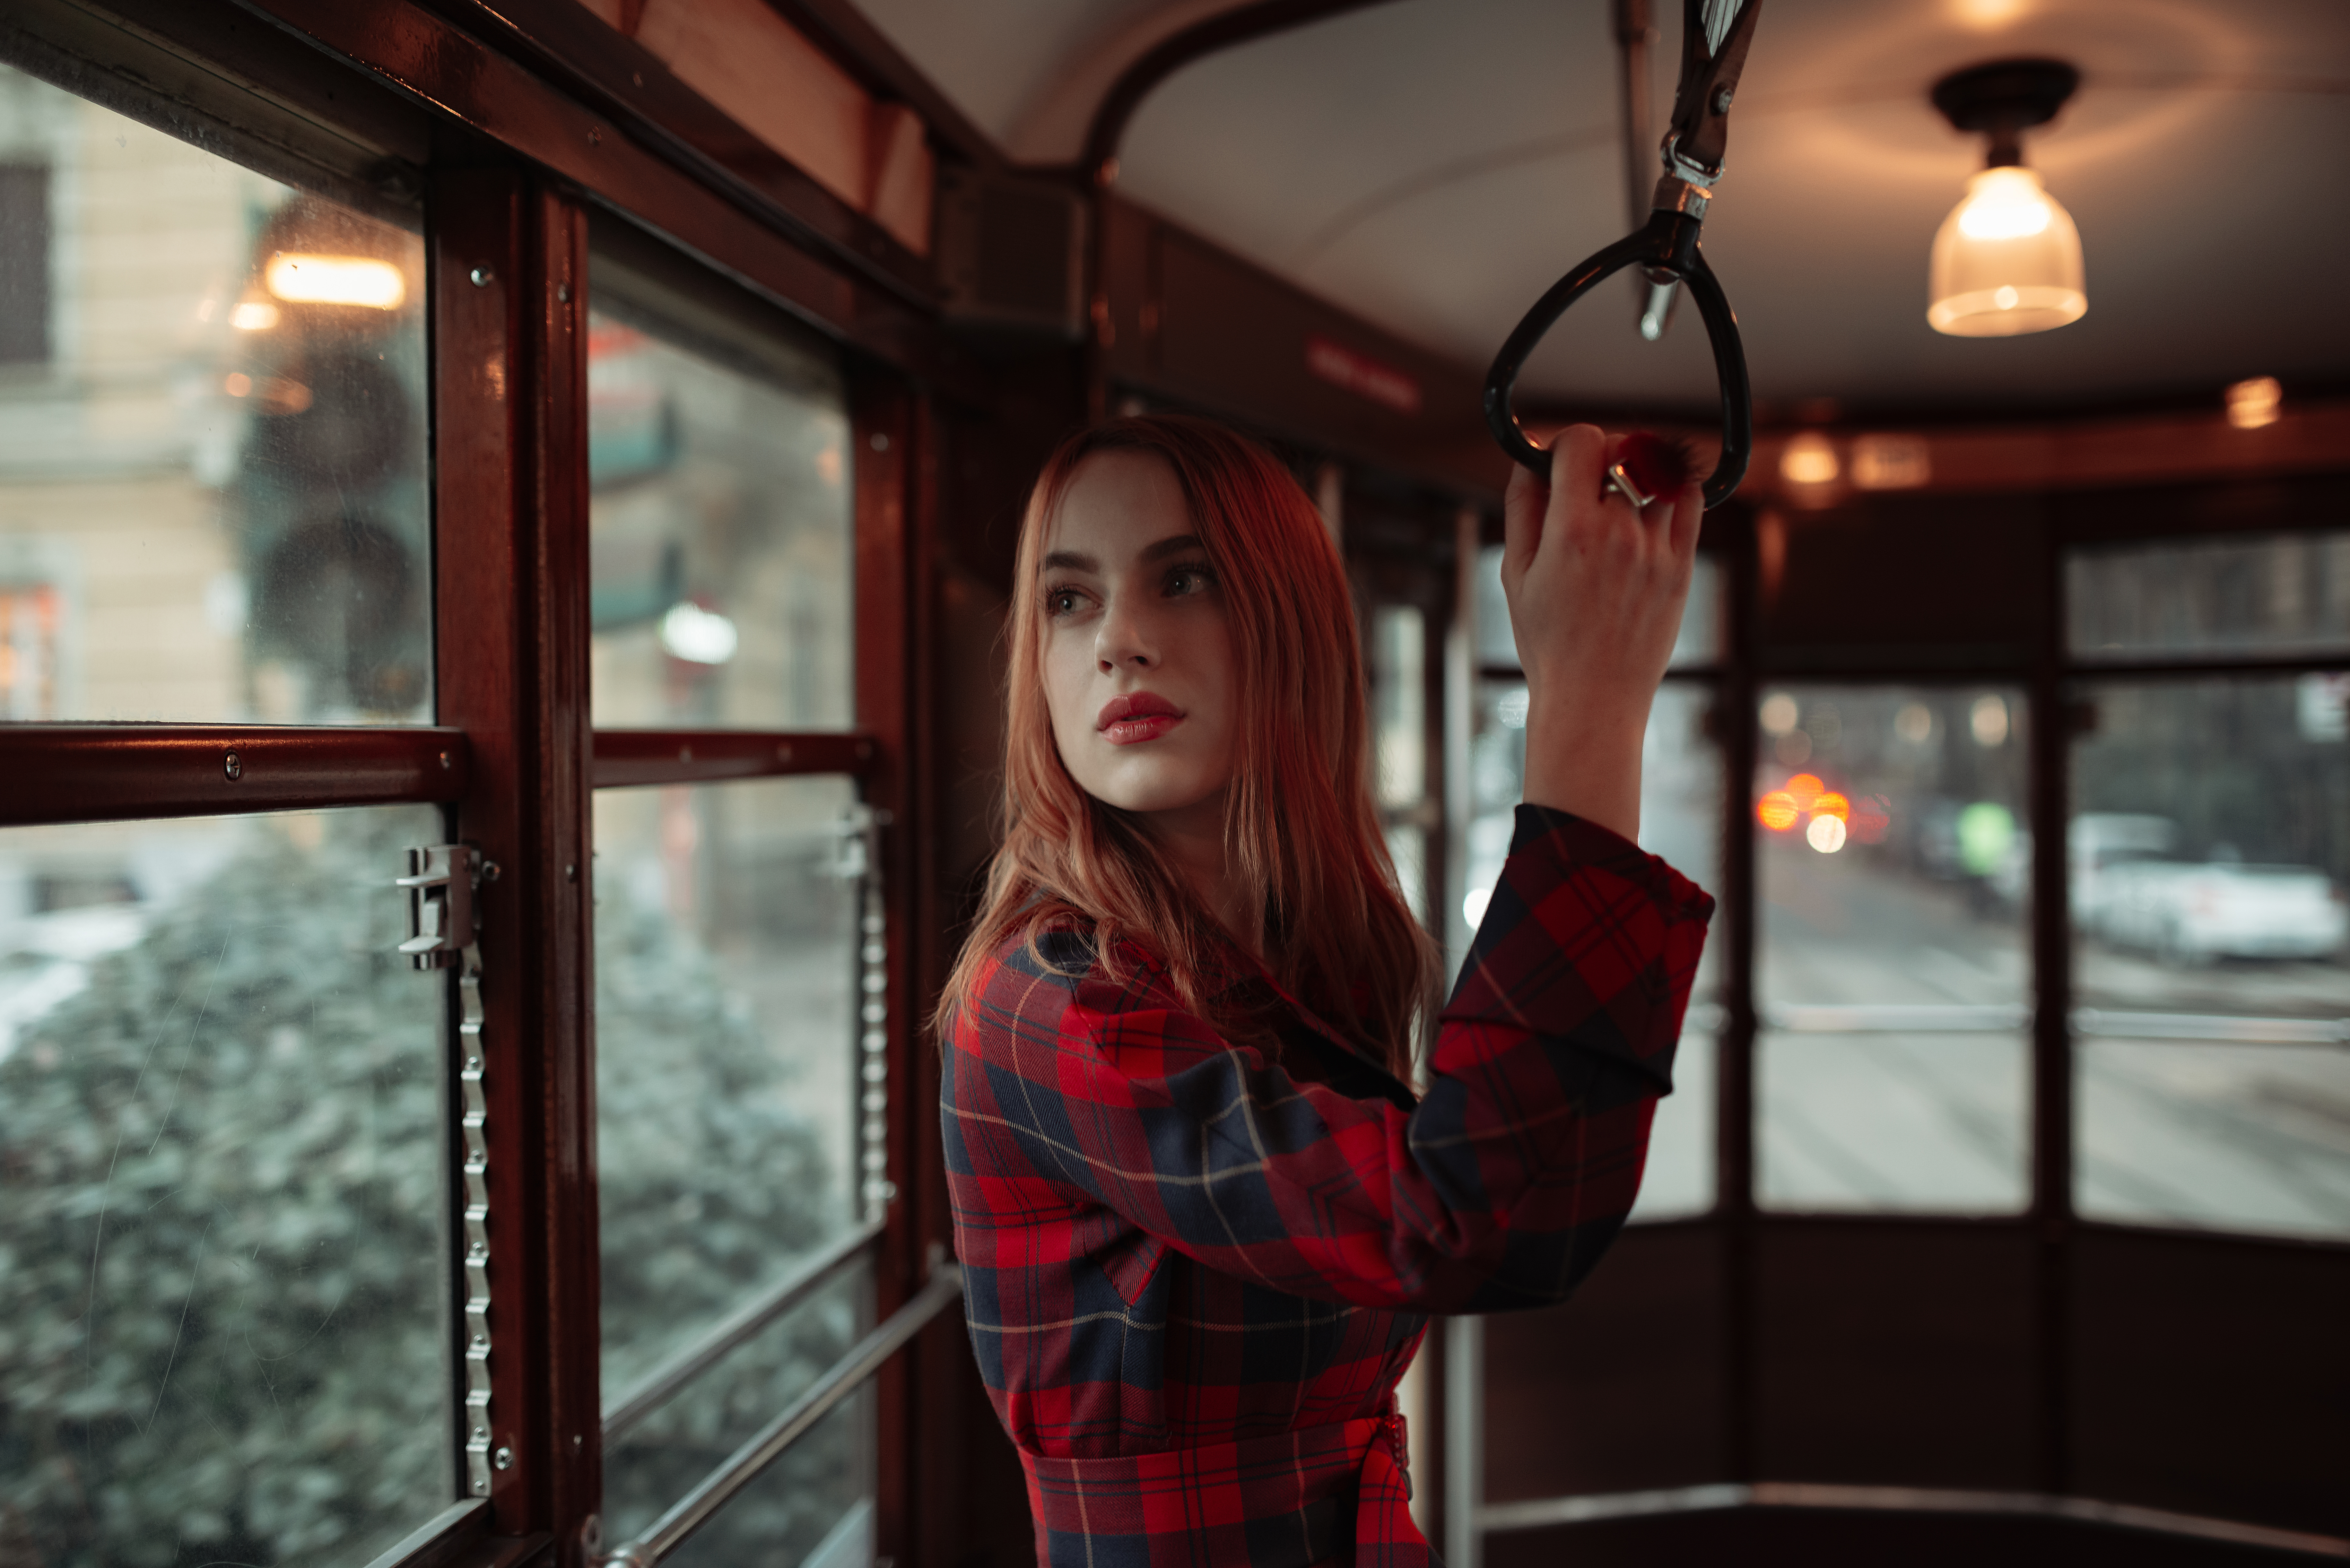 girl standing in tram 1575665240 - Girl Standing In Tram -